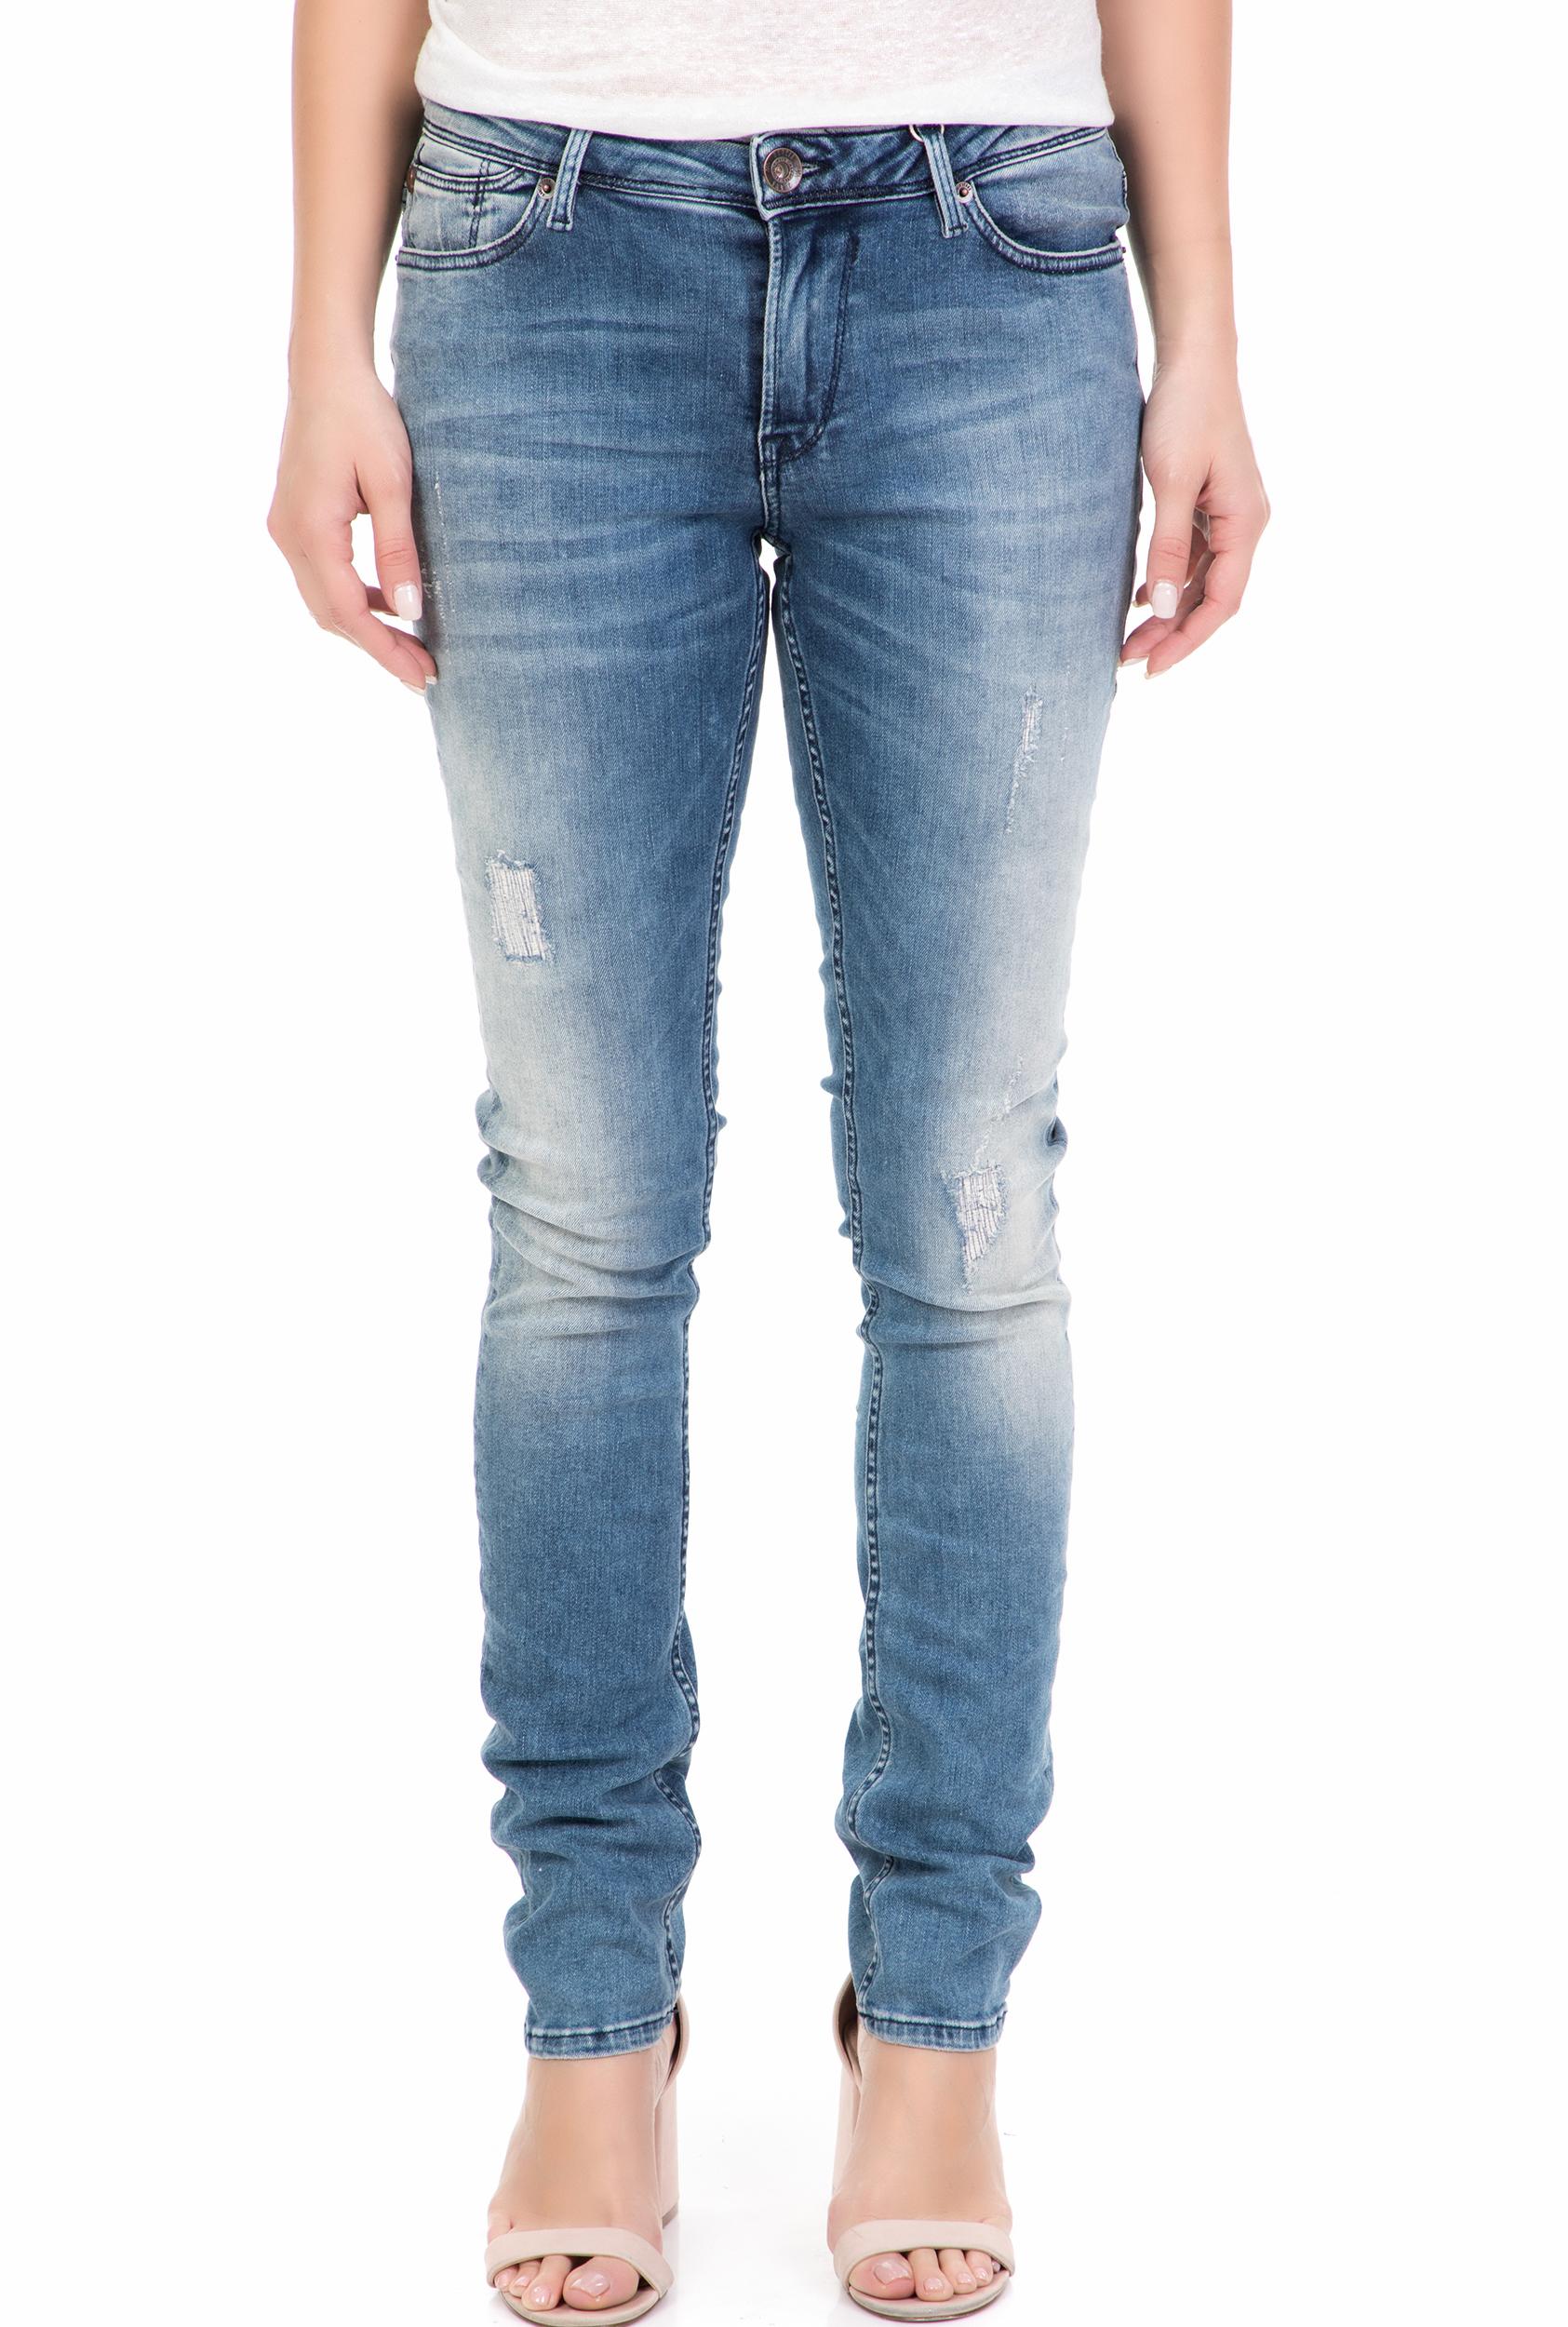 9907080865e GARCIA JEANS - Γυναικείο τζιν παντελόνι Riva GARCIA JEANS μπλε